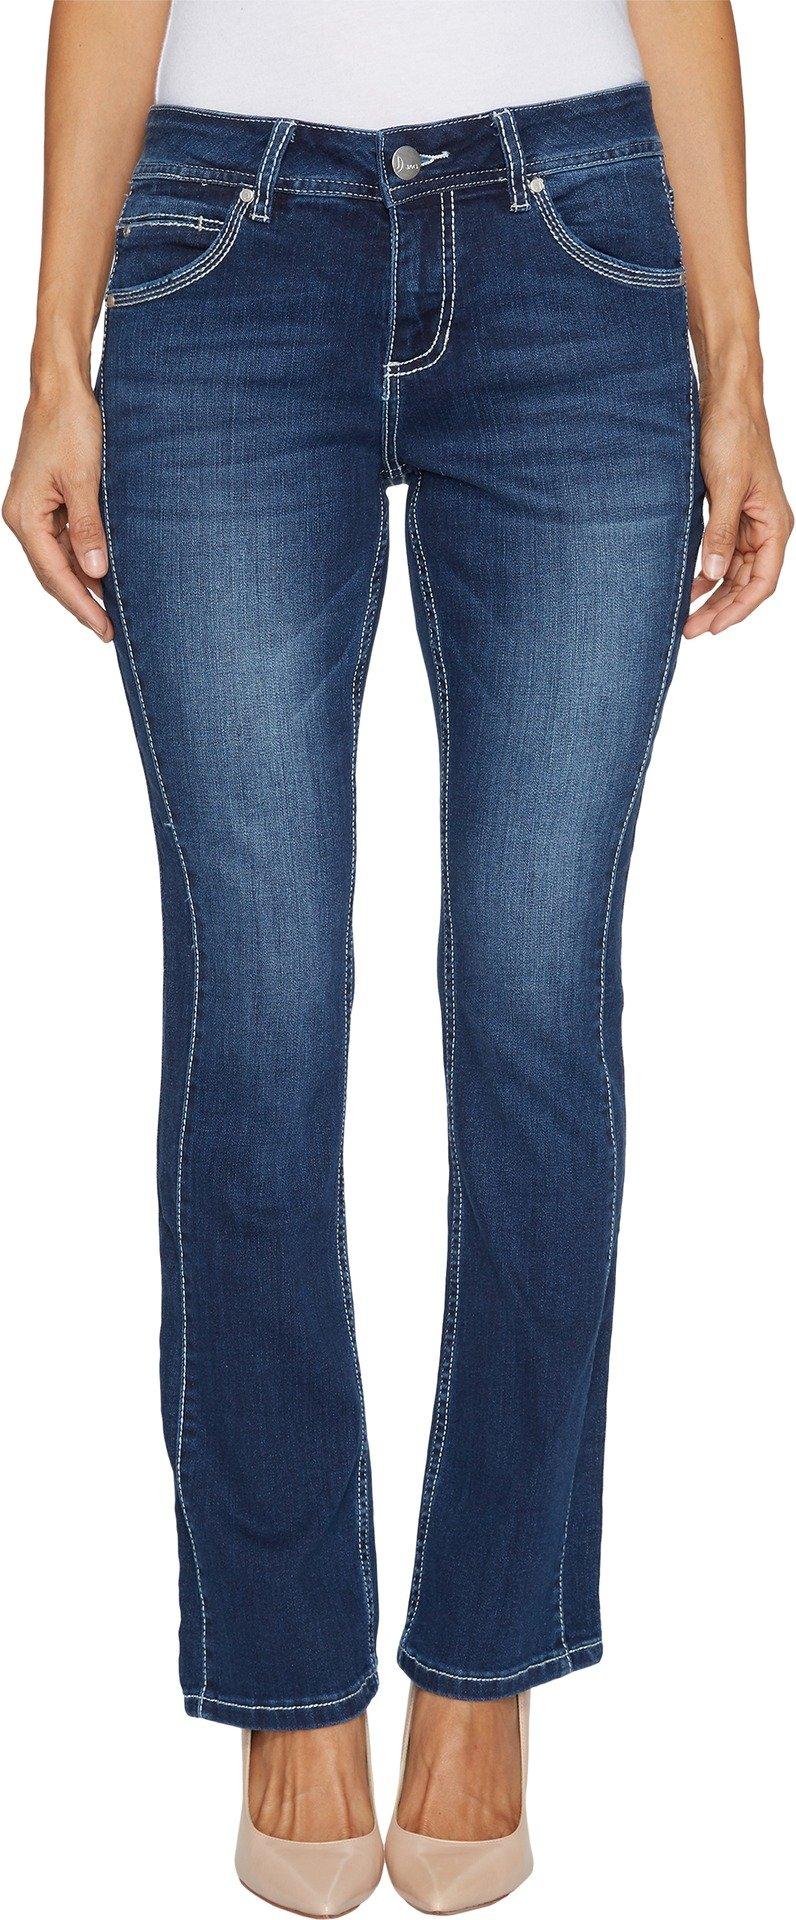 Jag Jeans Women's Petite Bianca Boot Jean, Bucket Blue, 2P